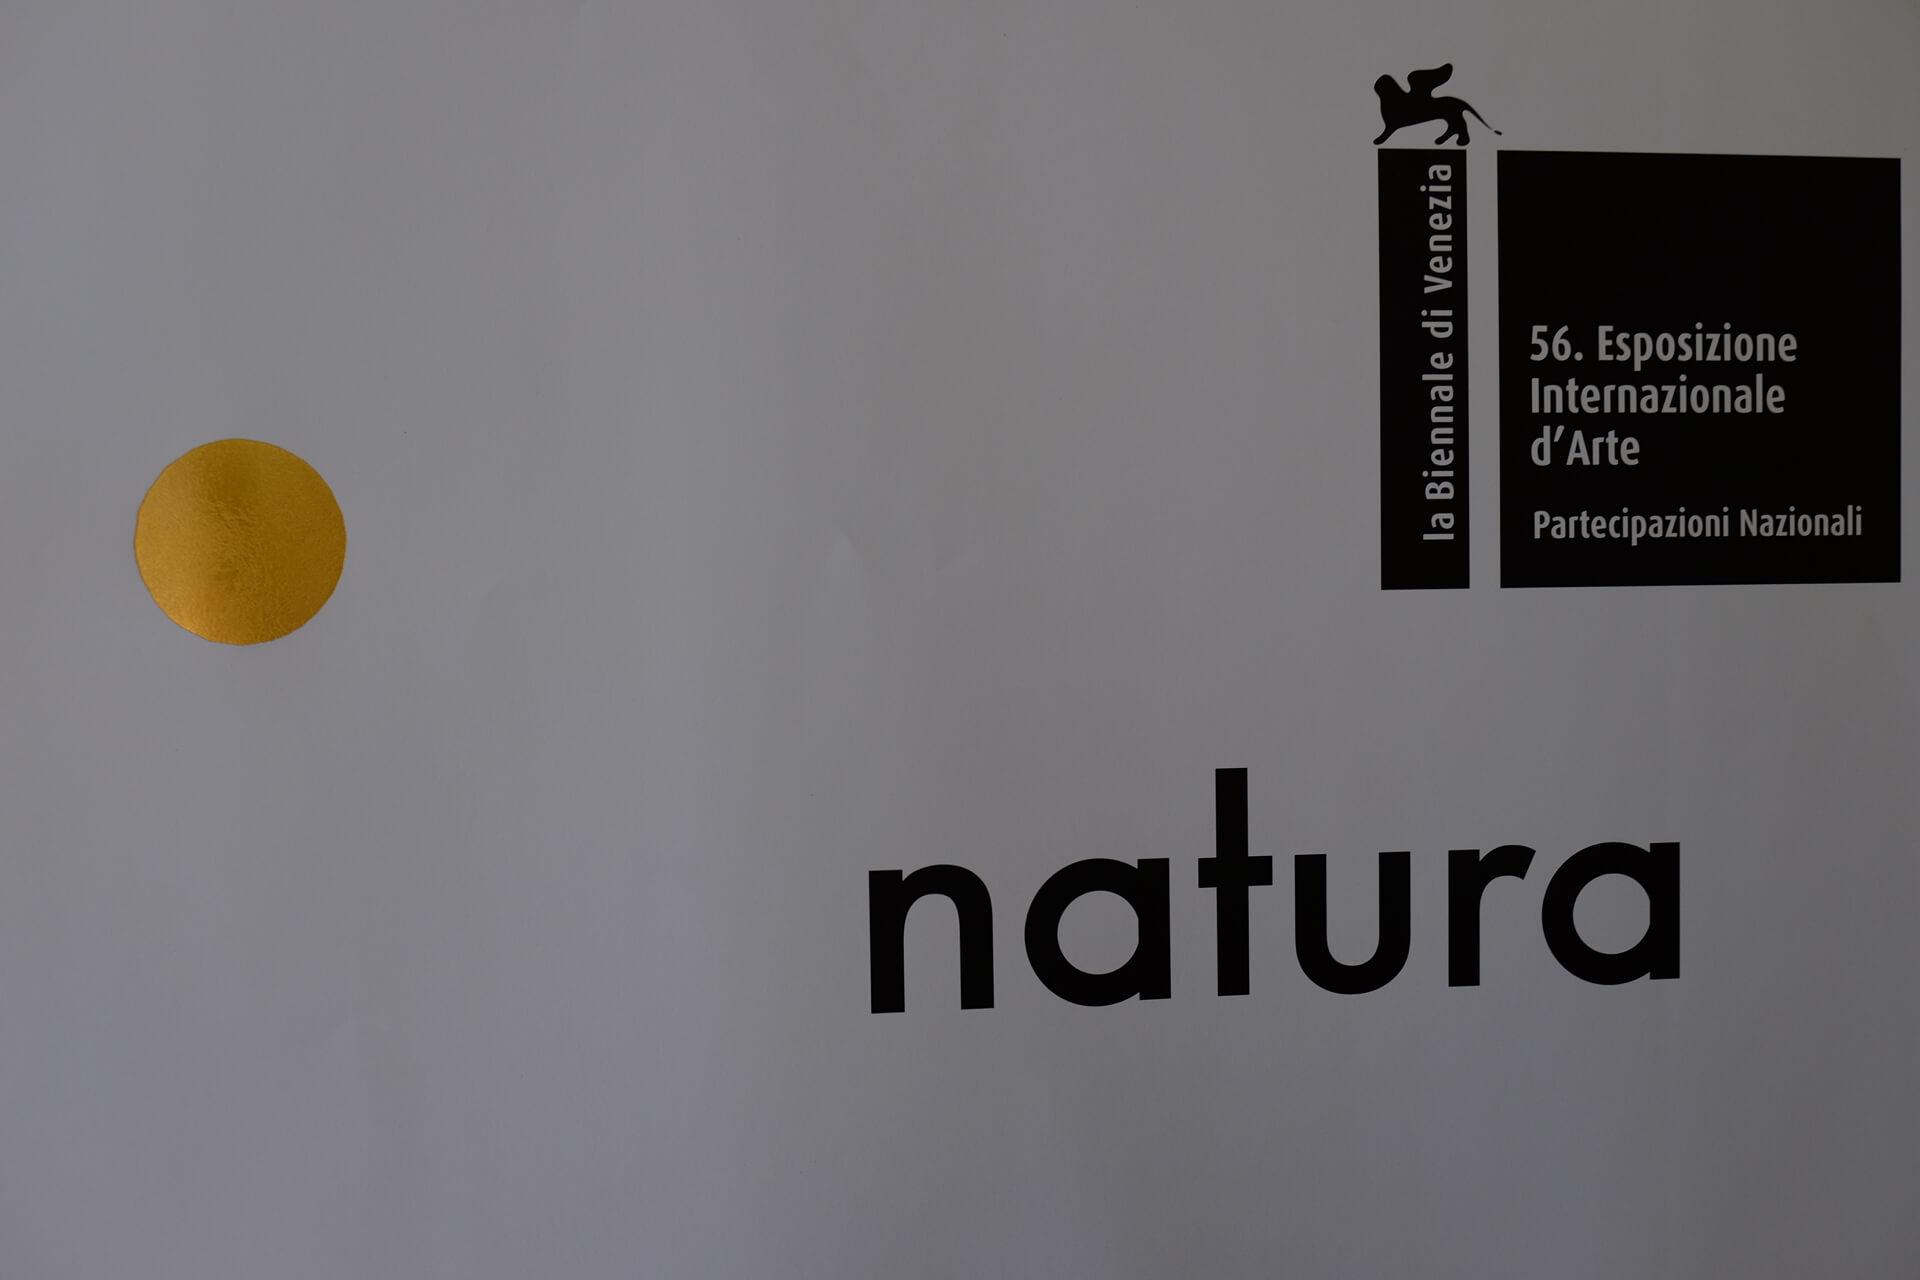 Natura Biennale d'arte, Venezia